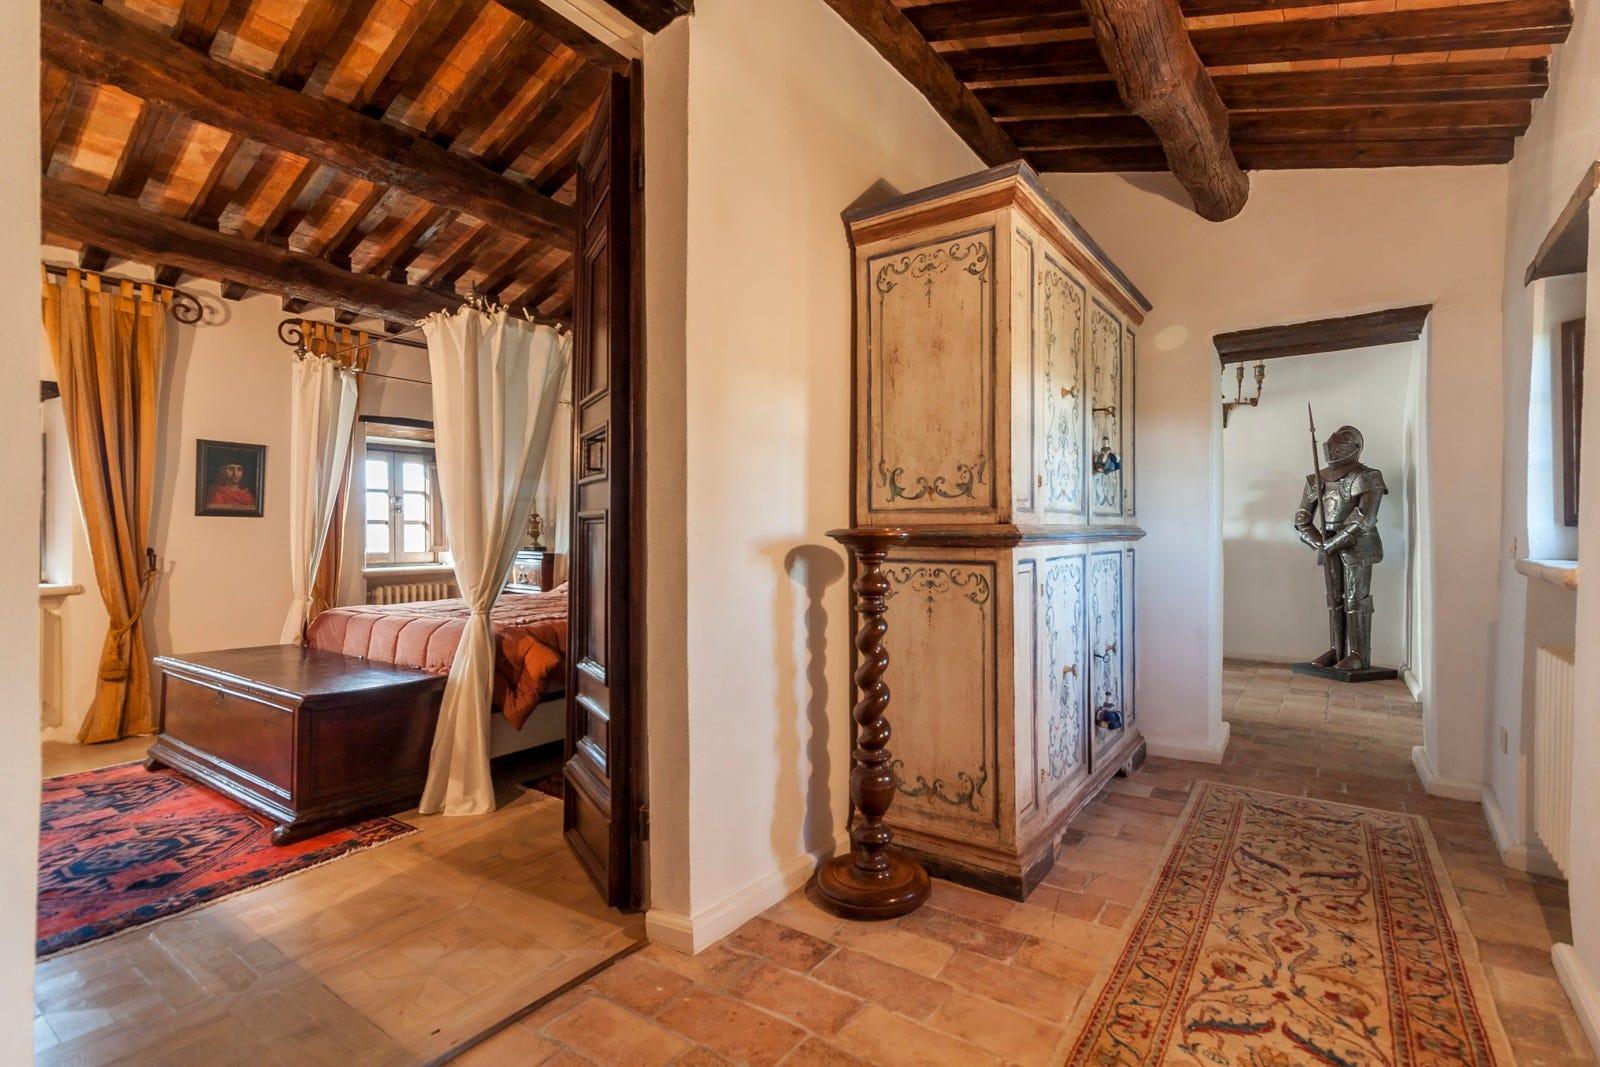 villa_patrizia_luxury_properties (9)